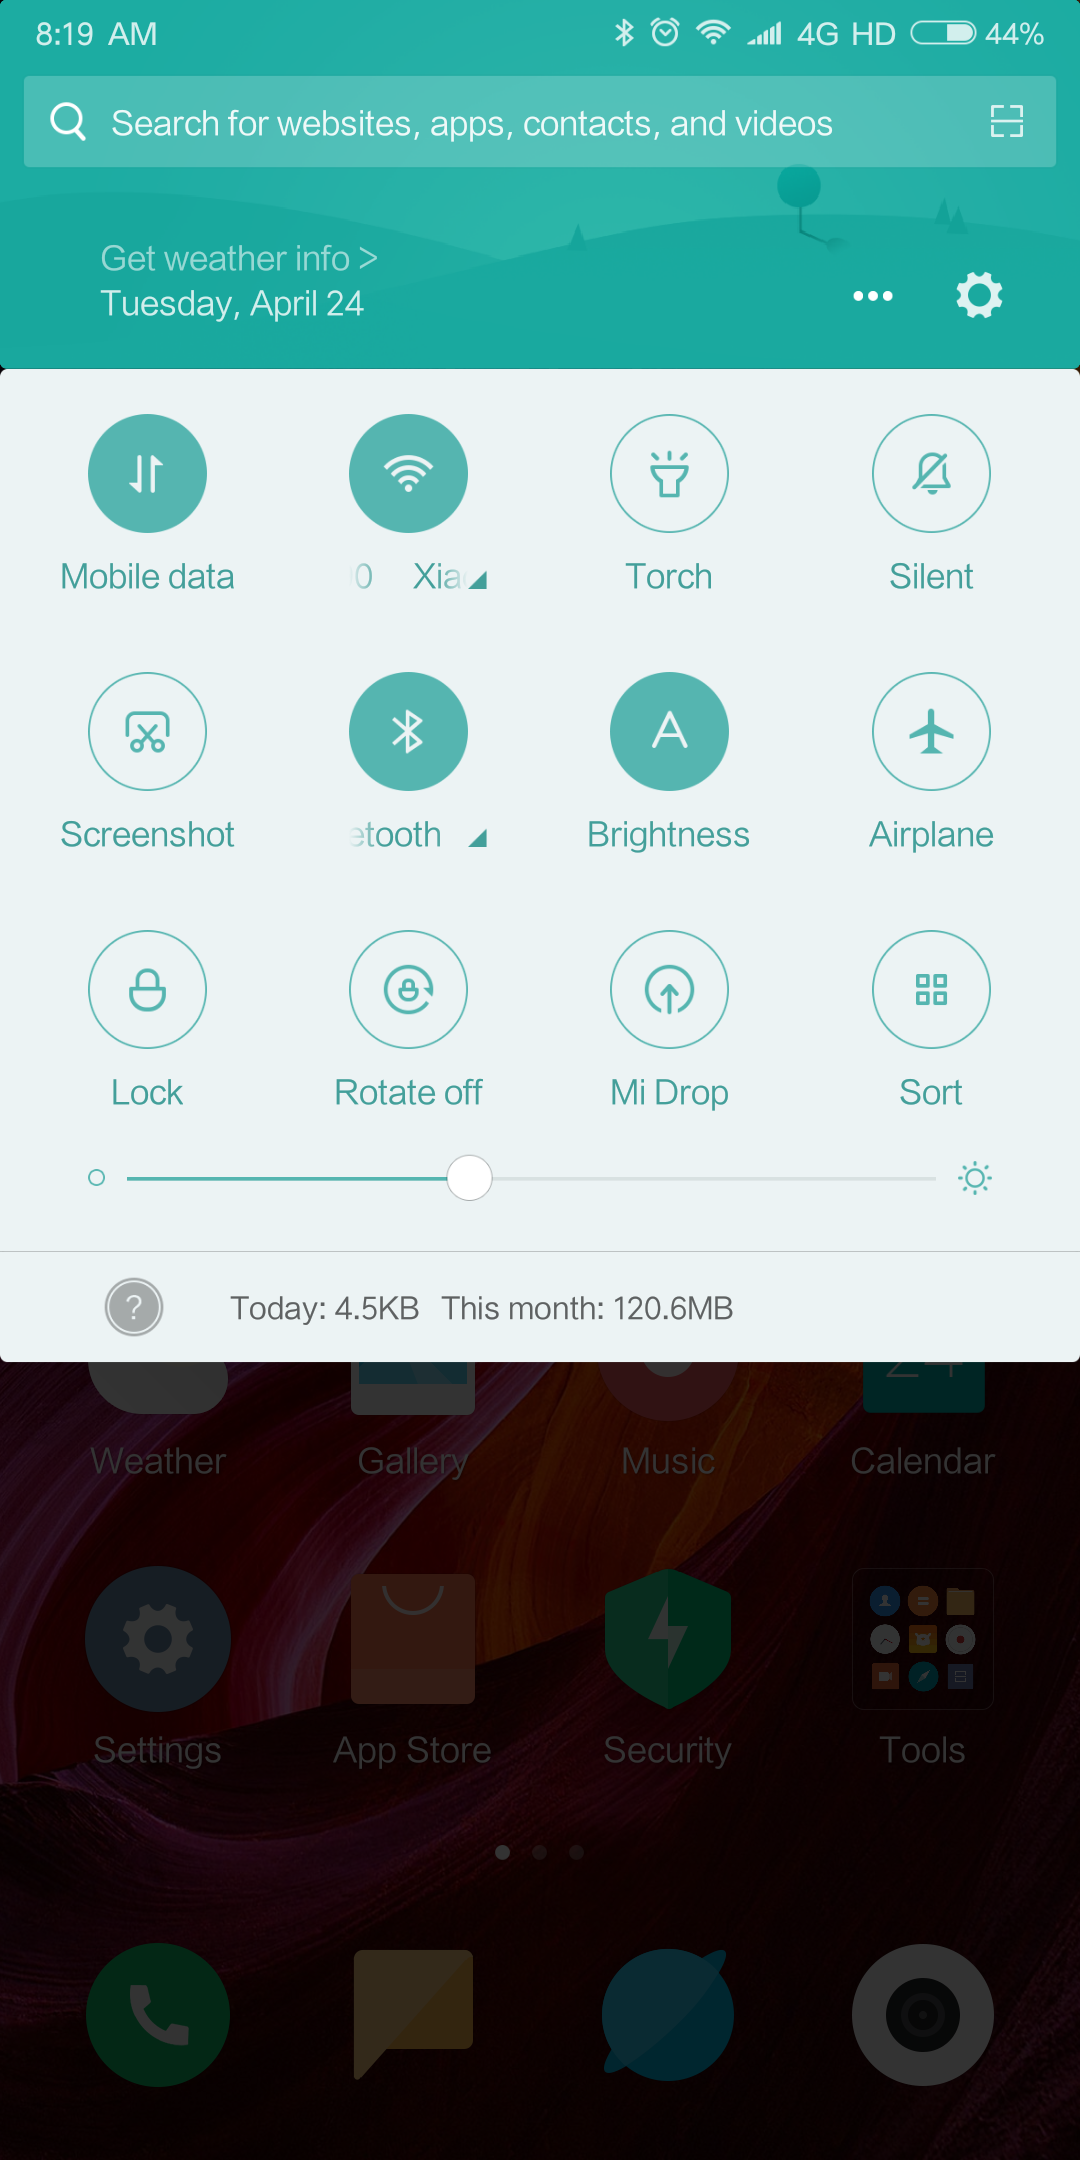 Xiaomi Mi Mix 2S MIUI System Android Oreo 8 1